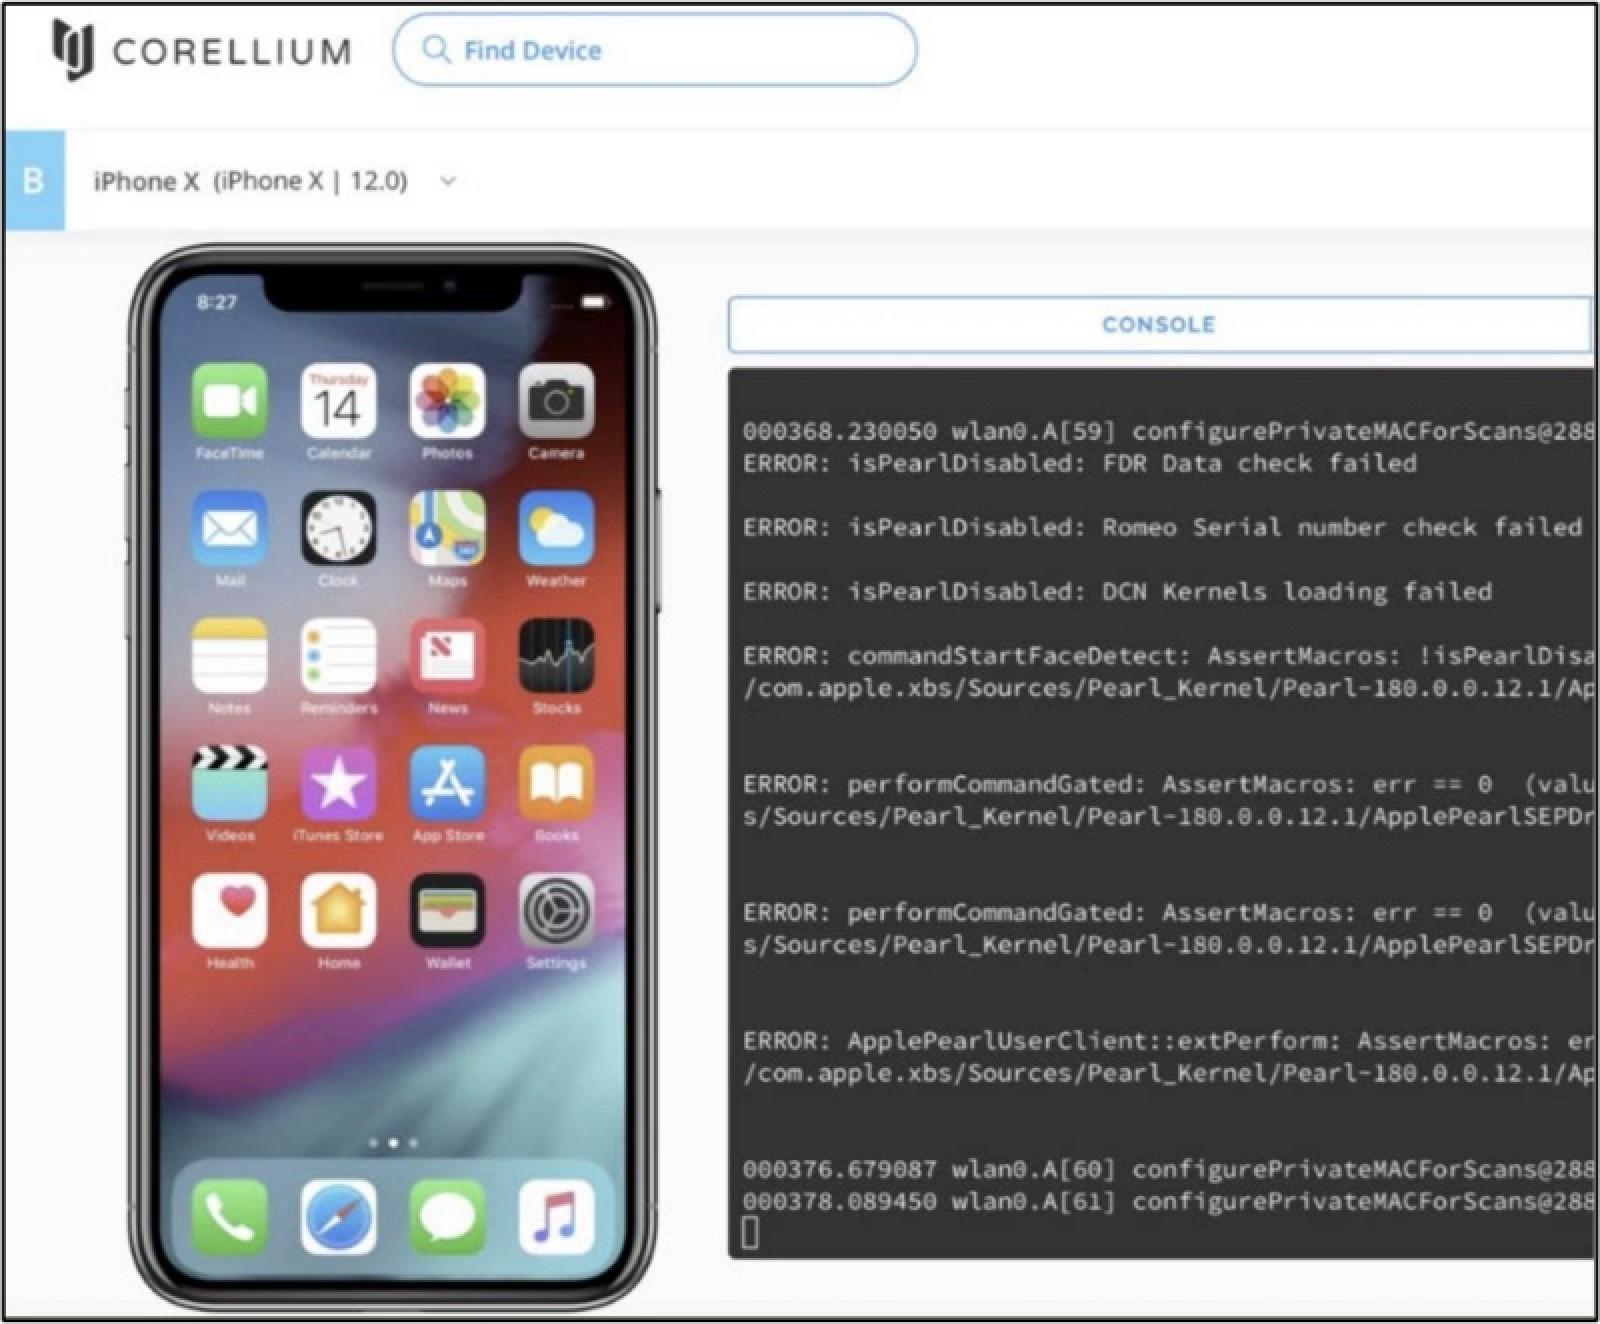 Techmeme: Apple sues mobile device virtualization company